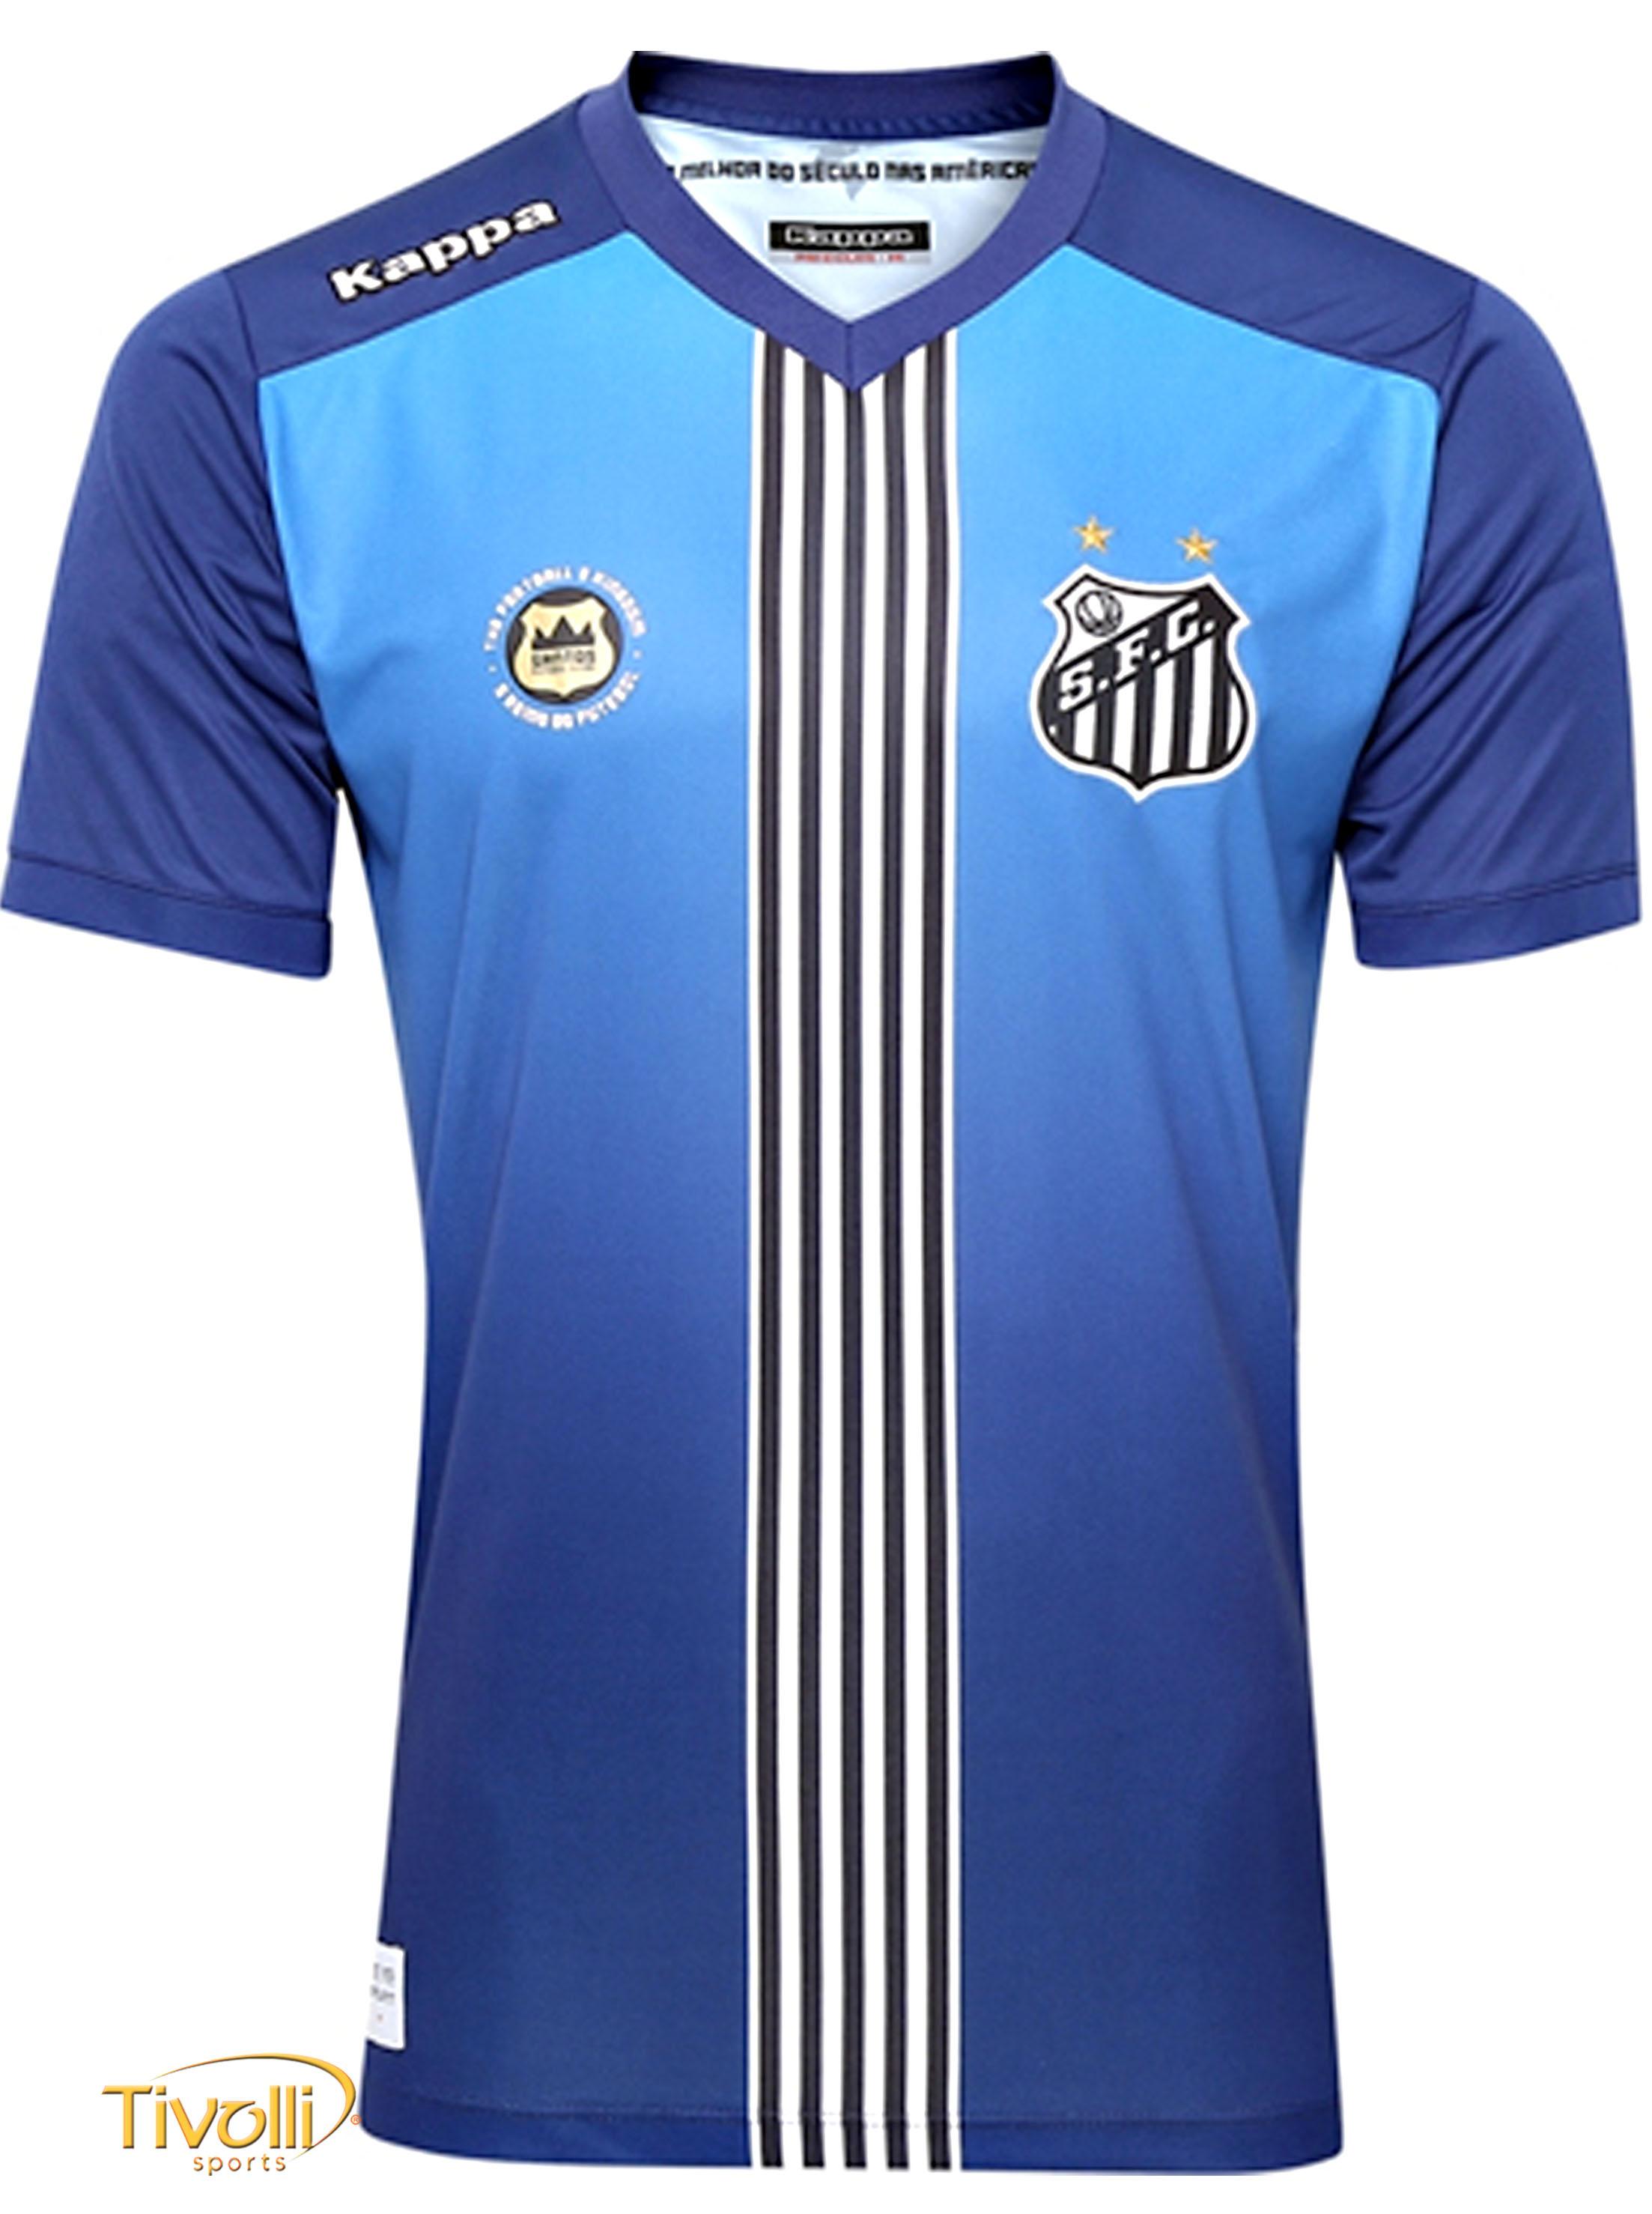 41f45c43fe Camisa Santos FC III 2016 2017 Kappa   Masculina - Mega Saldão